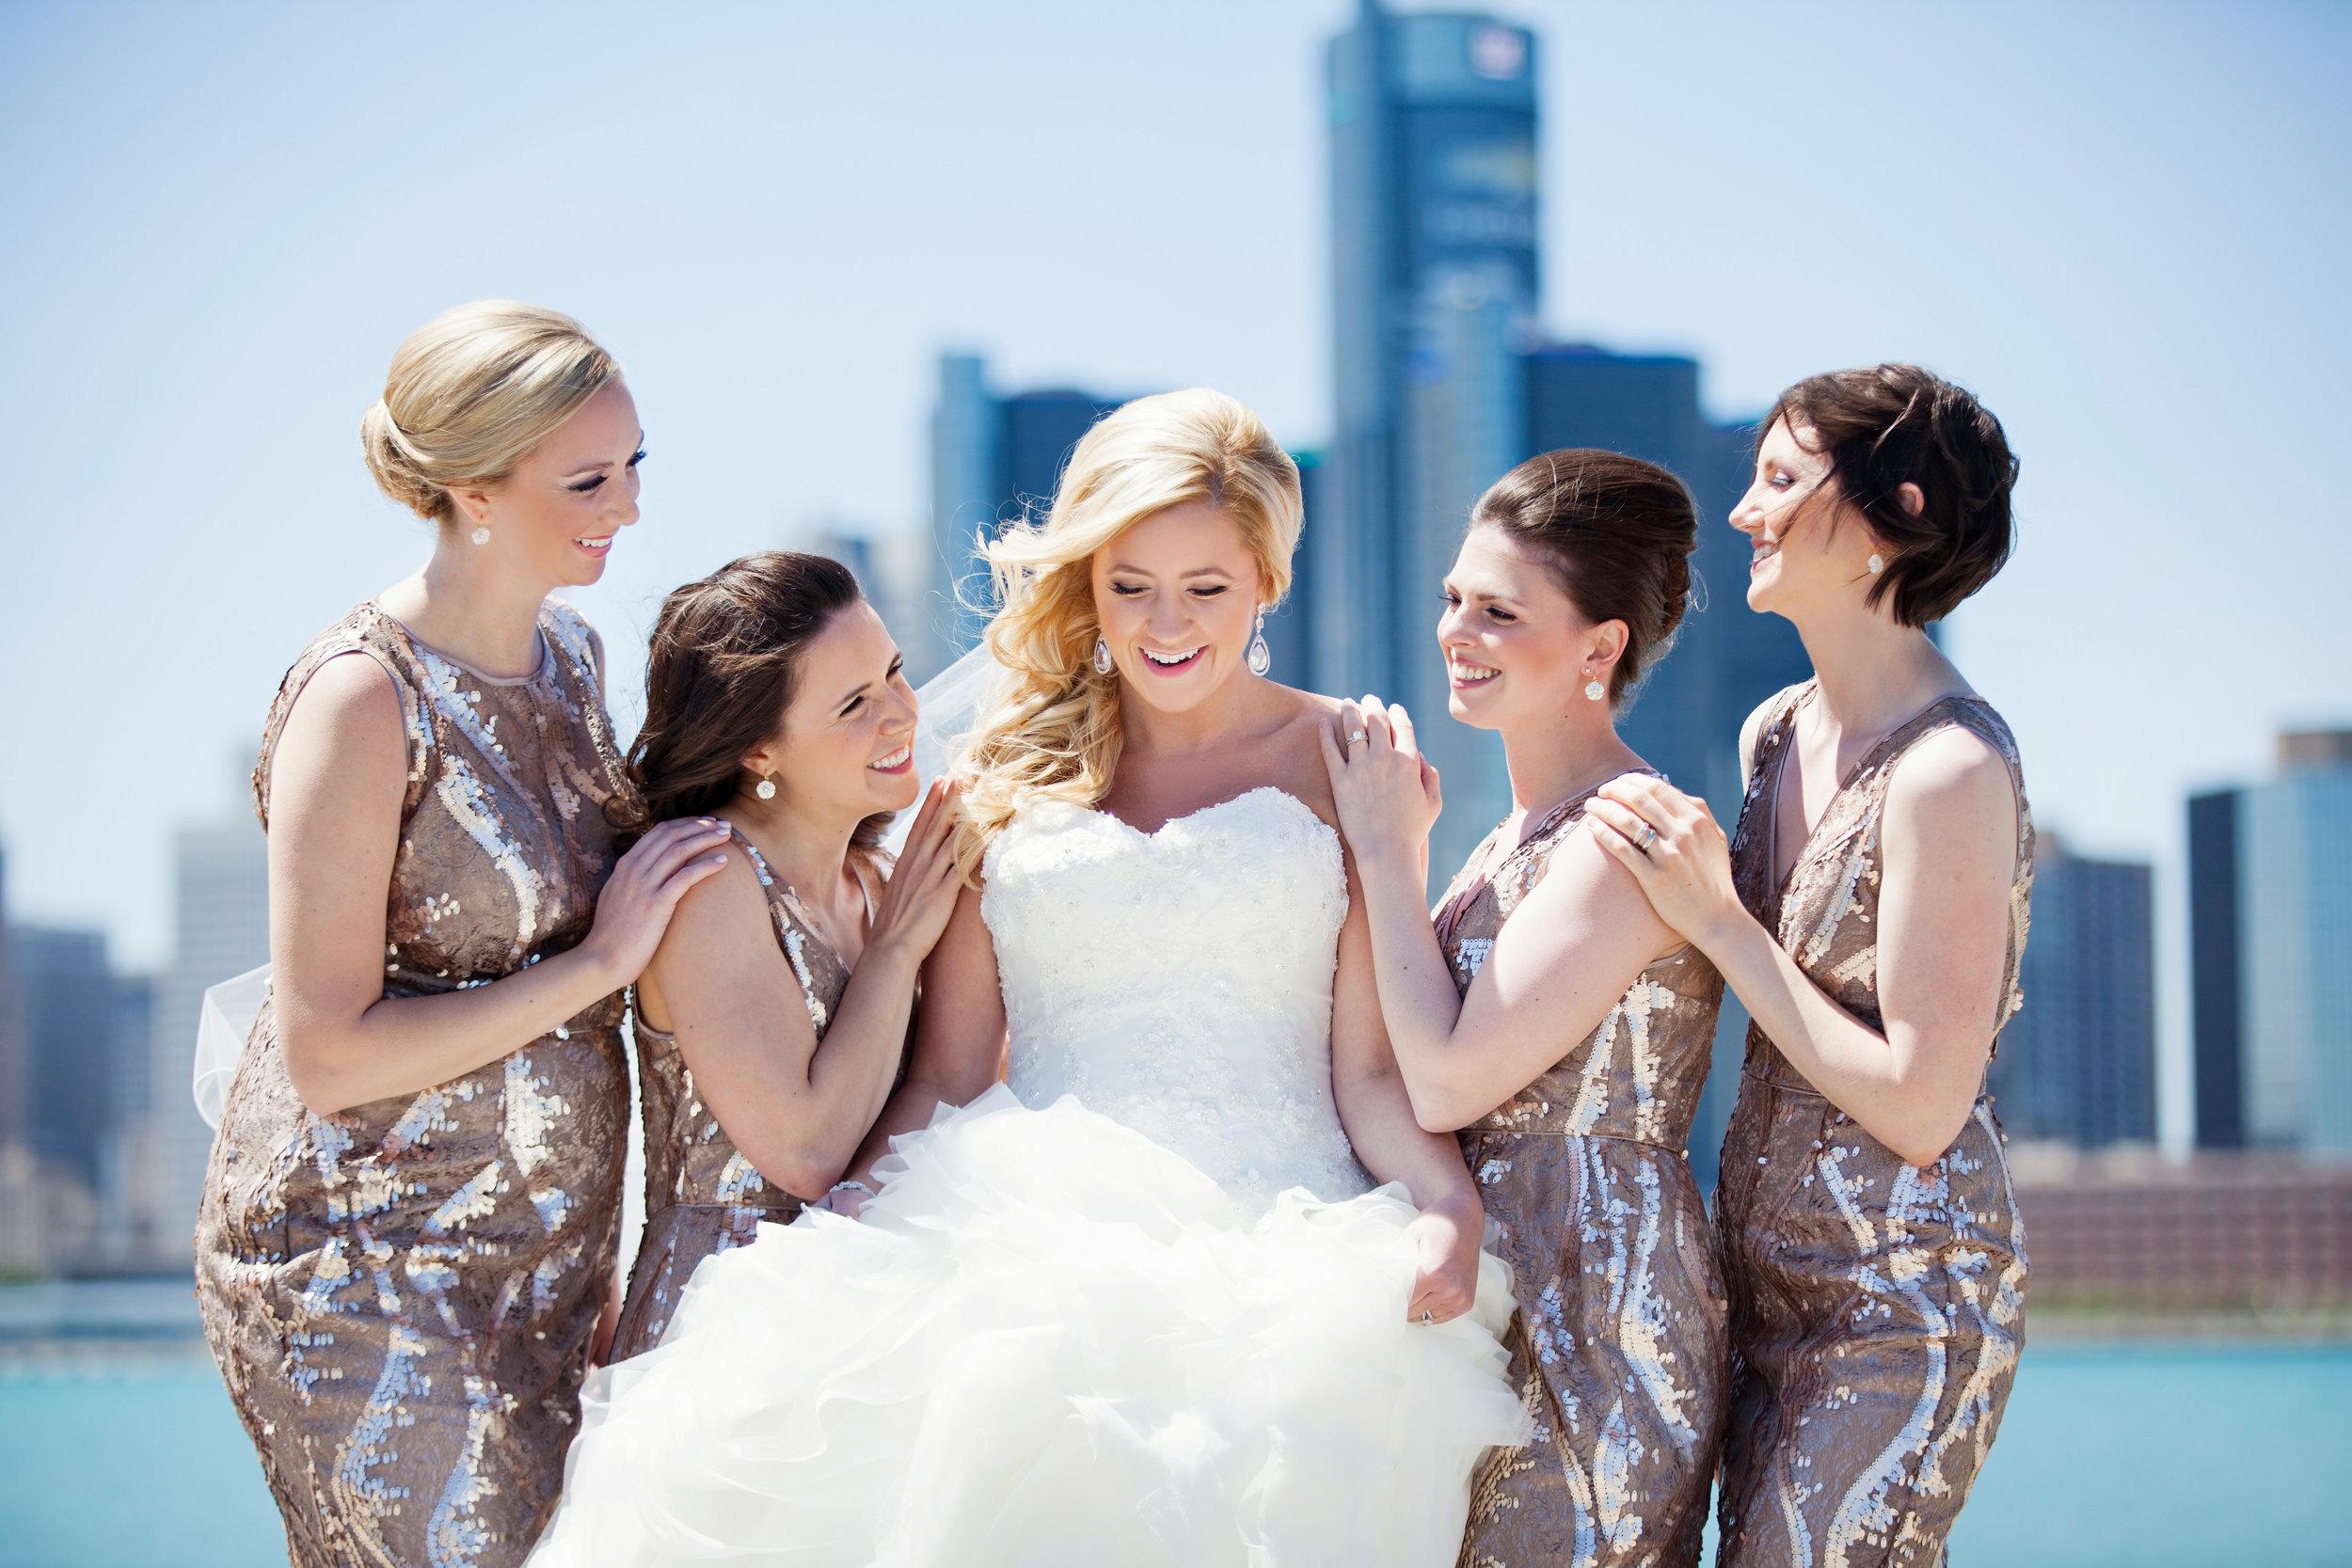 stylish-wedding-photography-windsor-toronto-ontario-wedding-photographer-winery-eryn-shea-photography-24.jpg